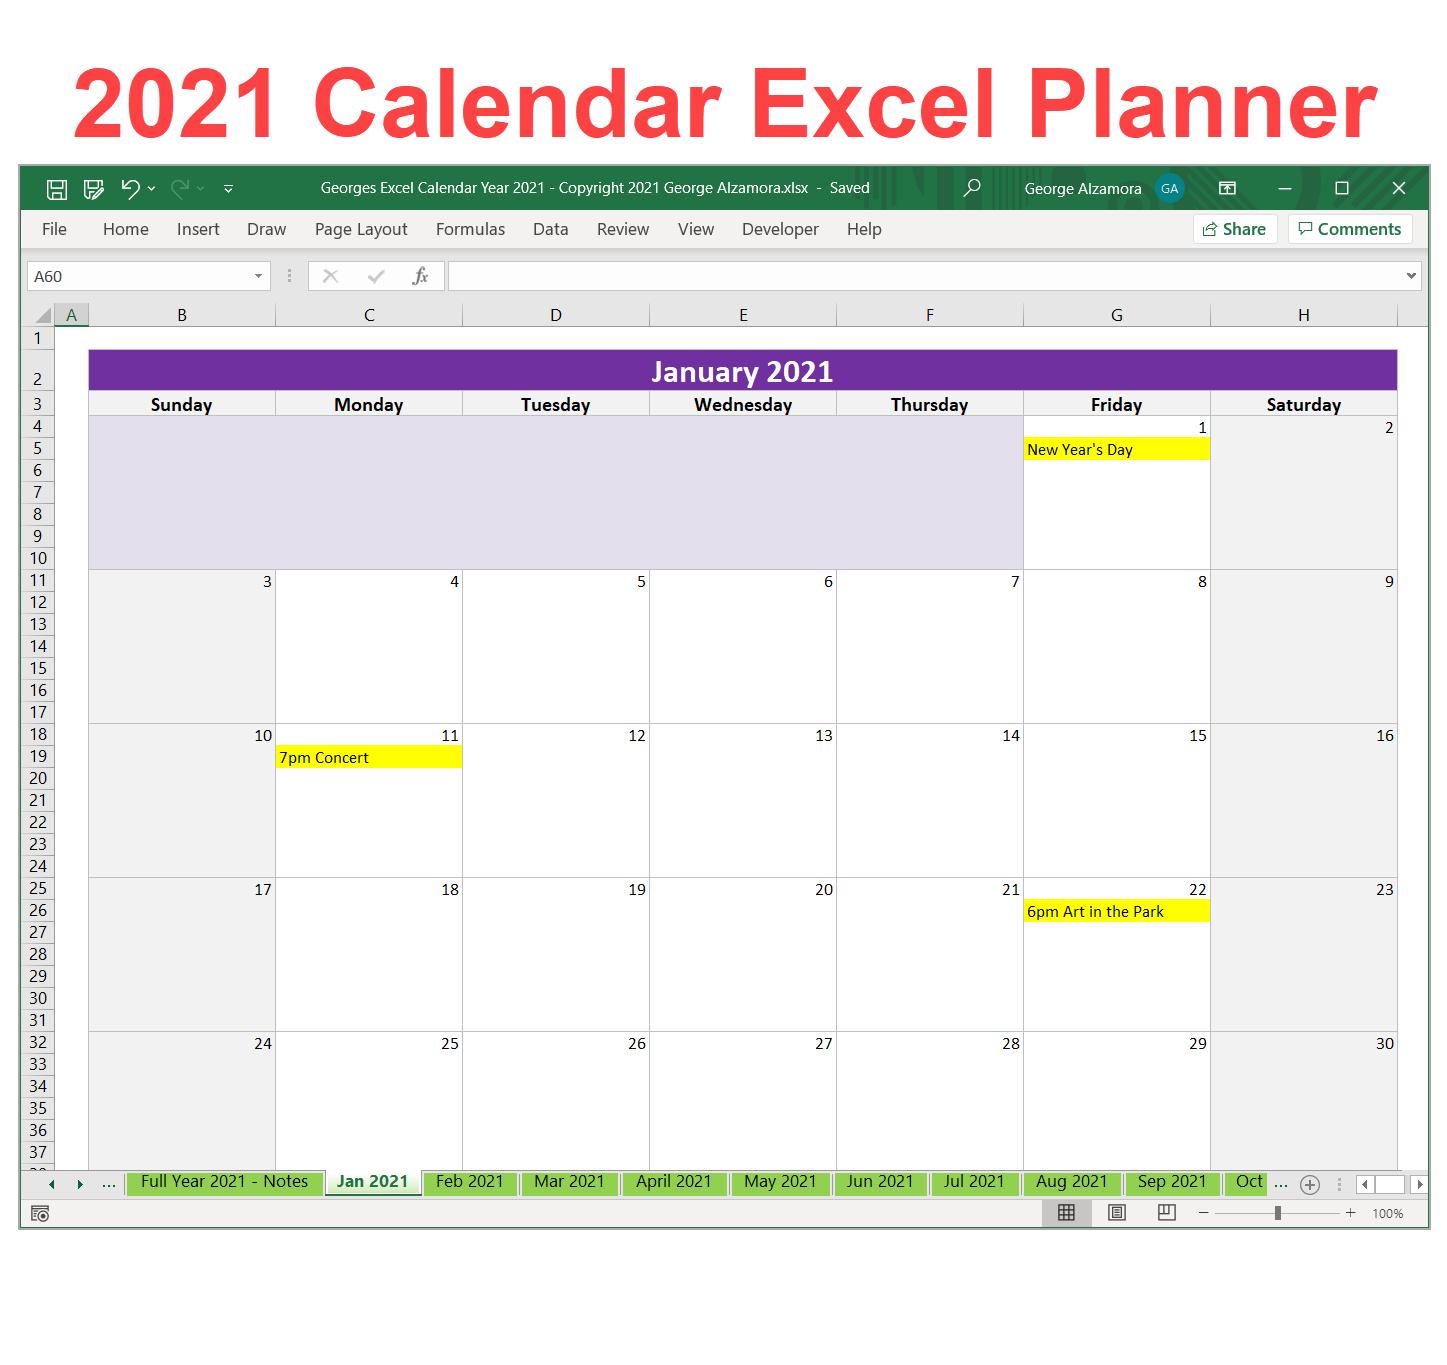 Georges Excel Calendar Year 2021 In 2020 Excel Calendar Excel Calendar Template Calendar Template